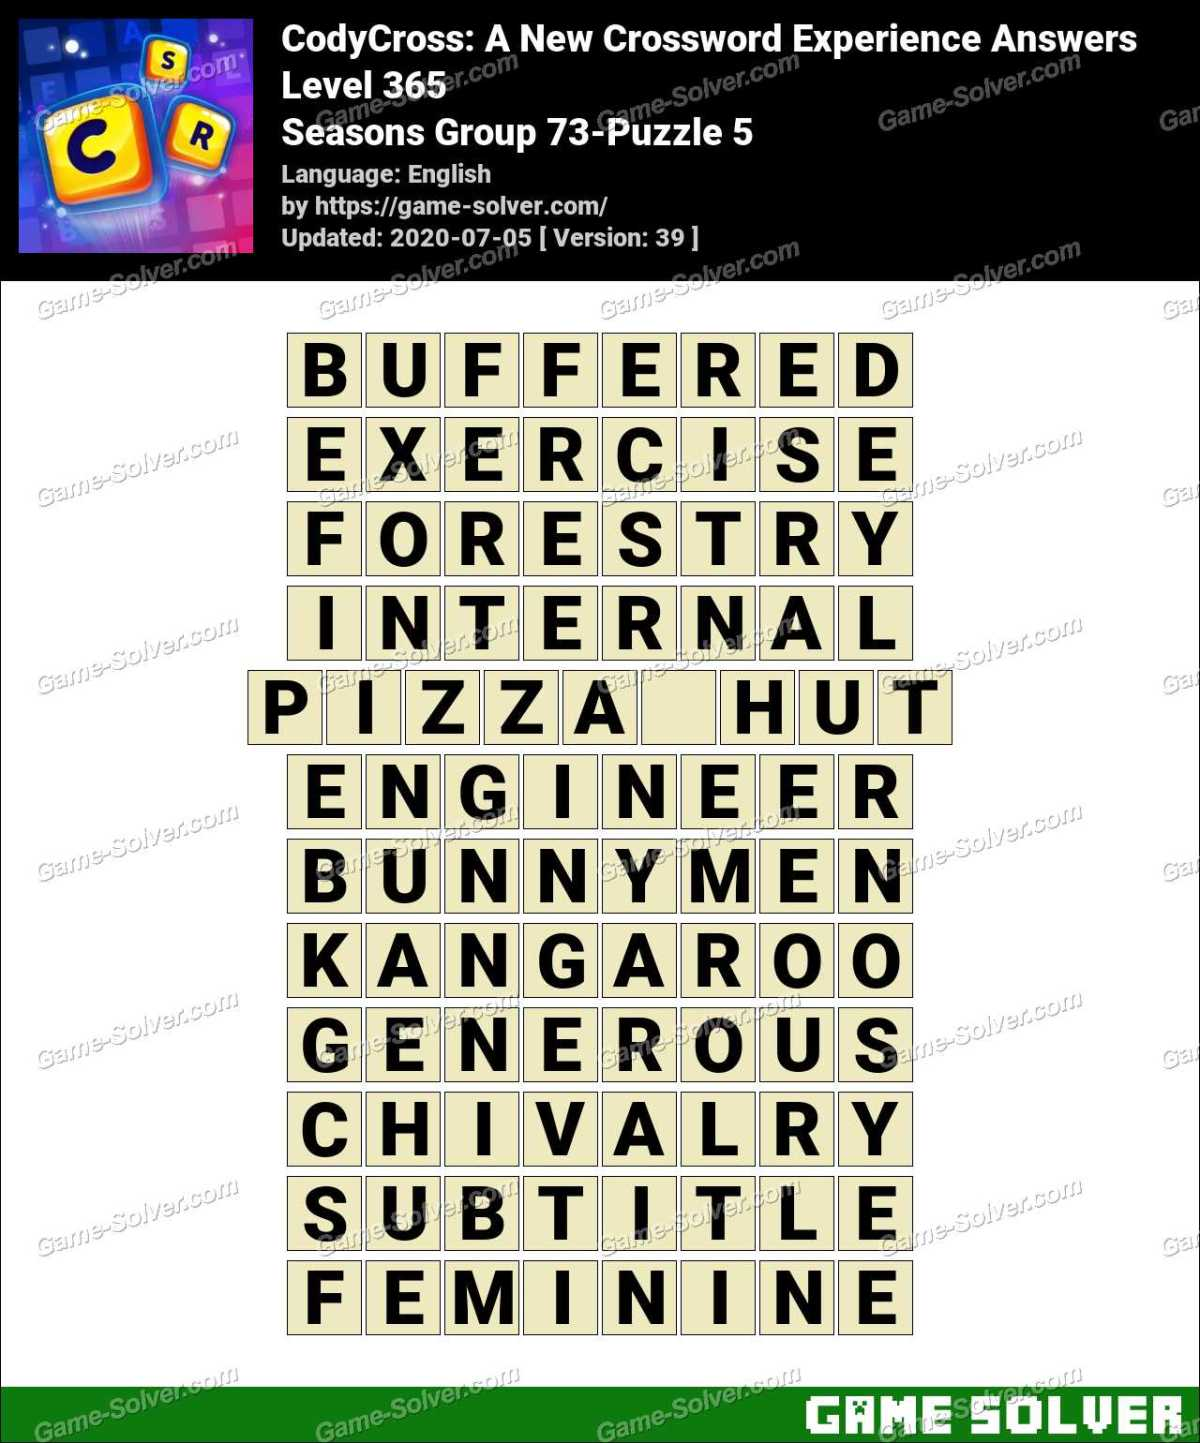 CodyCross Seasons Group 73-Puzzle 5 Answers